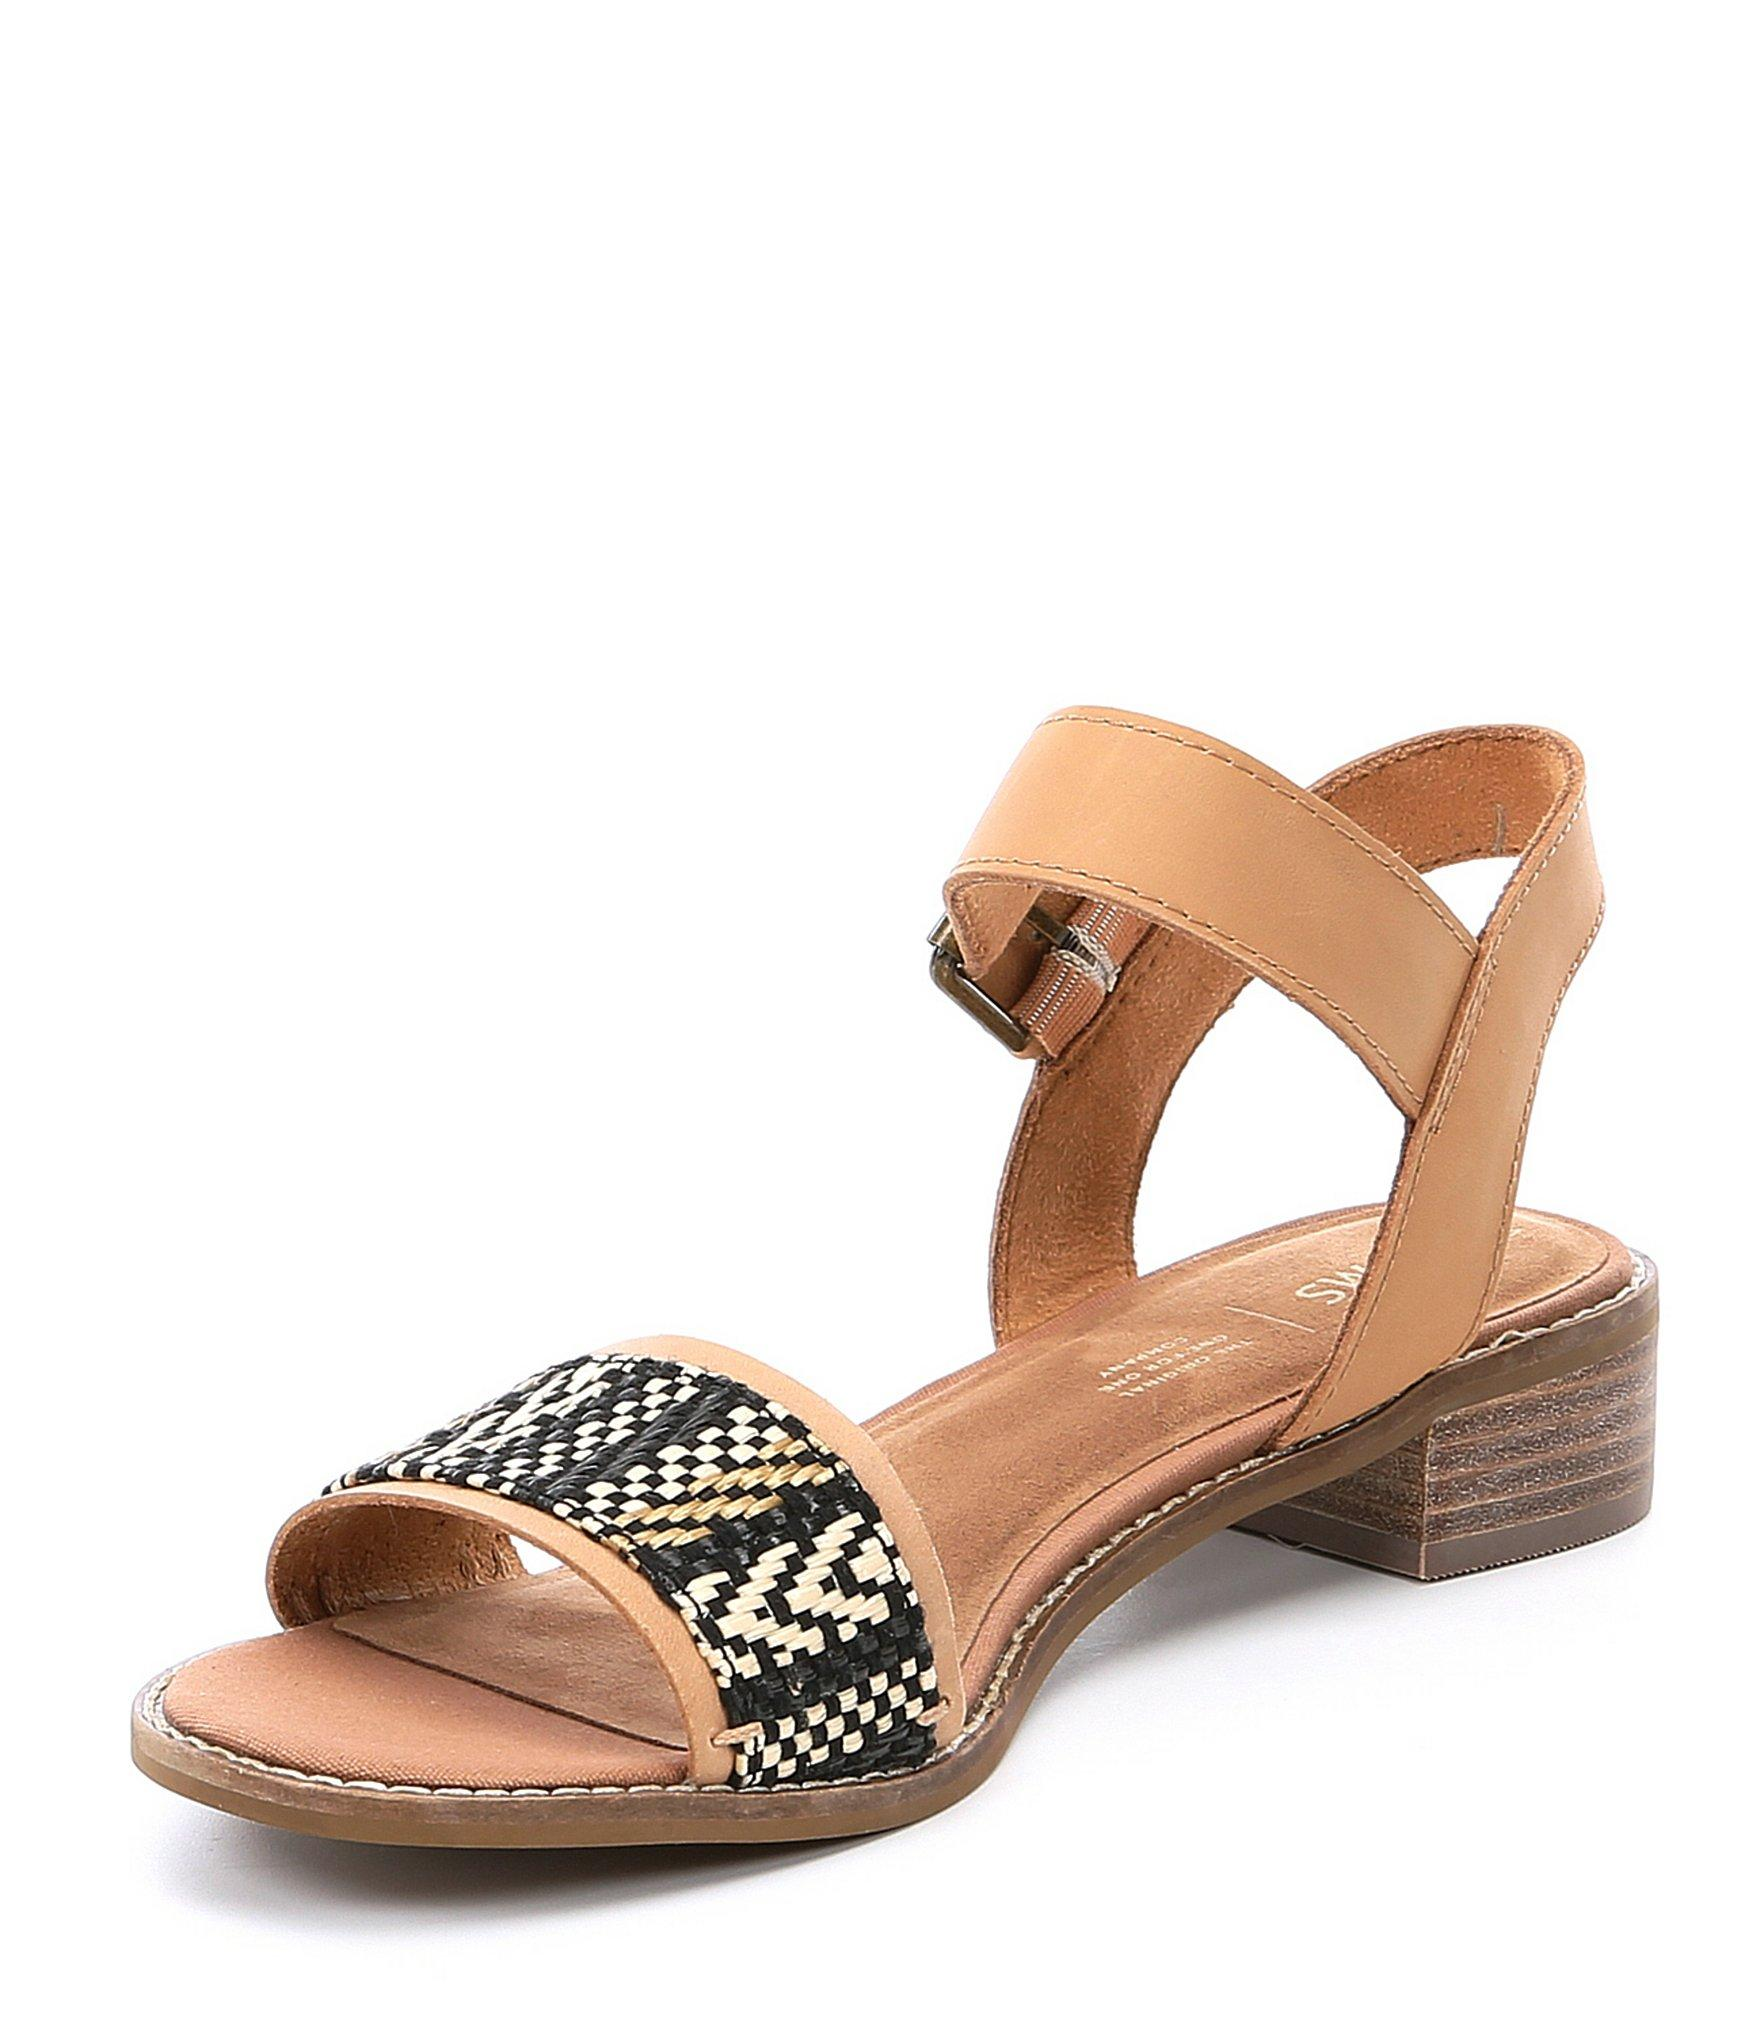 932a811b29b TOMS - Brown Camilia Leather Geo Woven Block Heel Sandals - Lyst. View  fullscreen